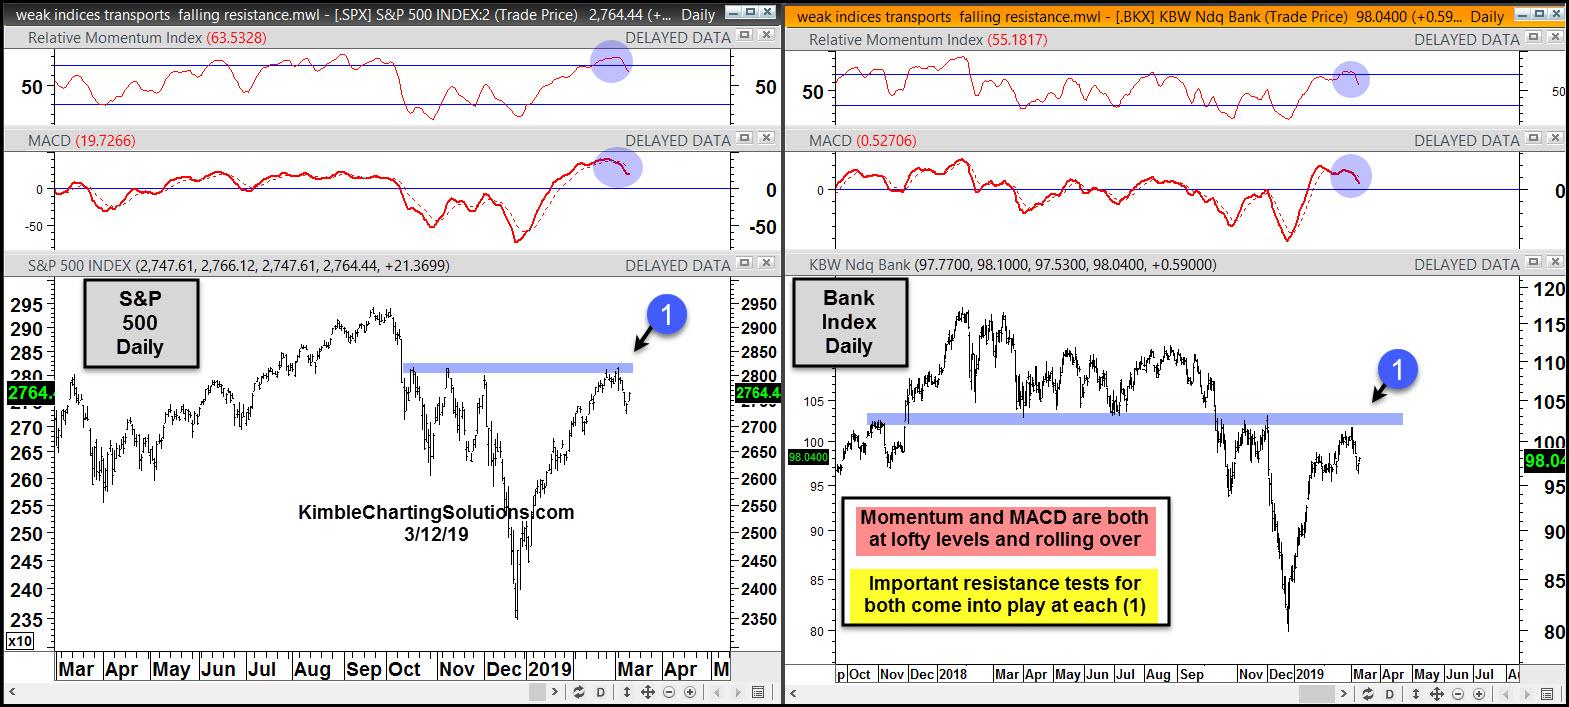 S&P 500 (left), Bank Index